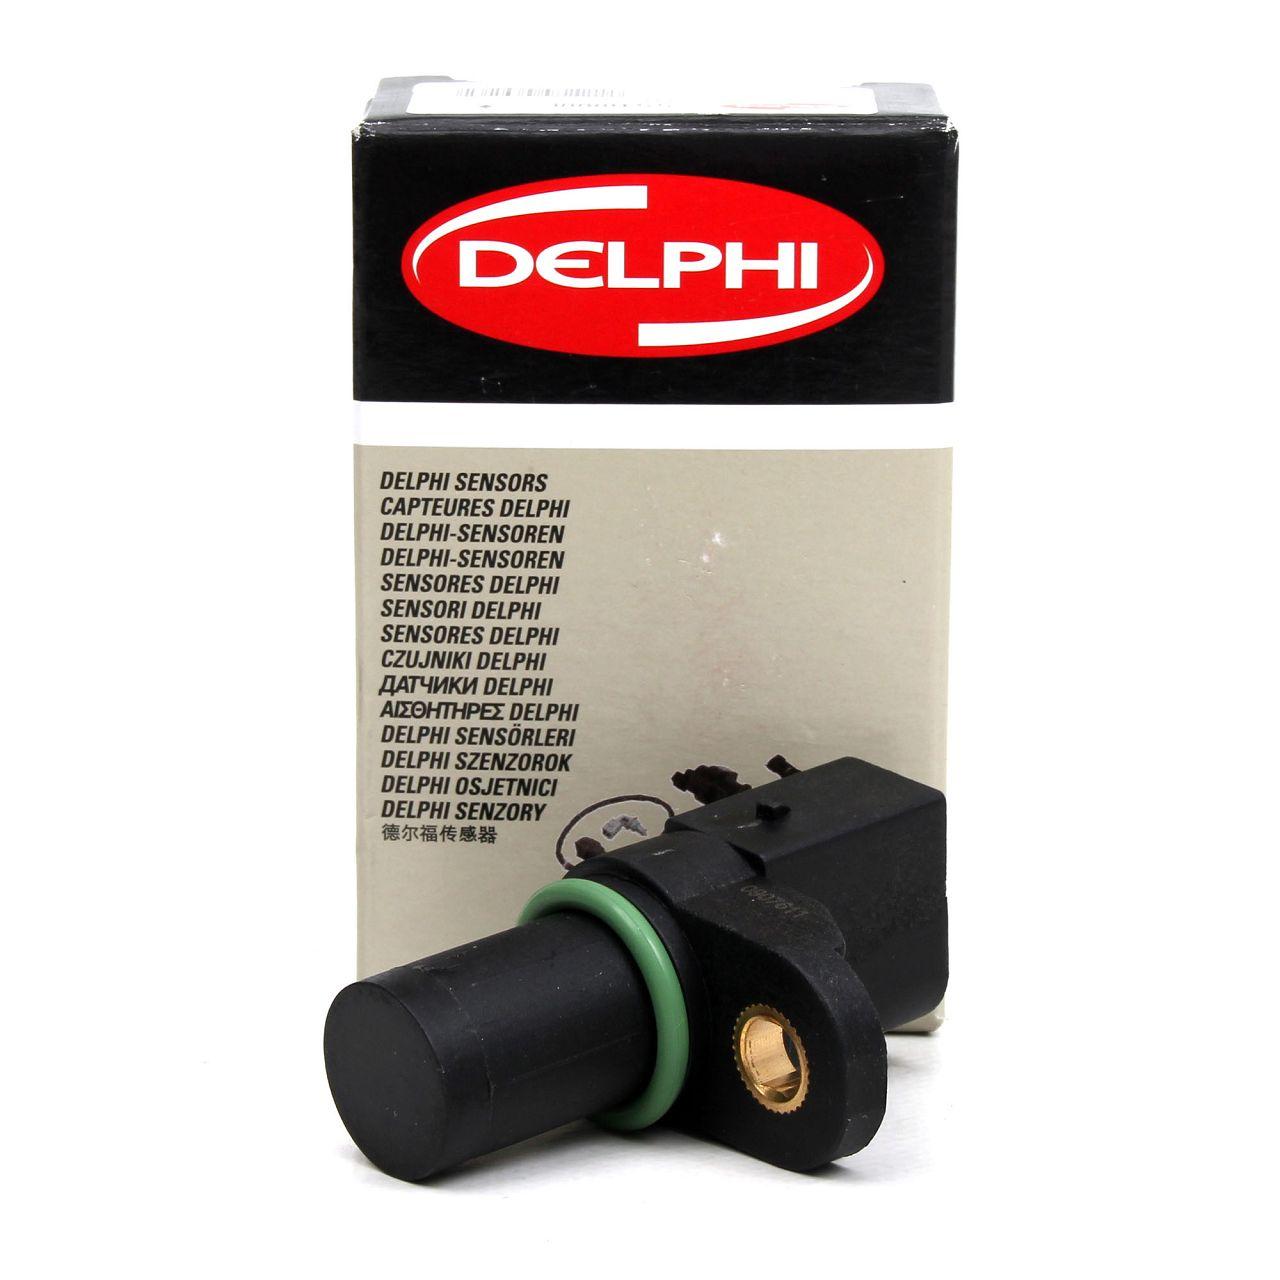 DELPHI SS10888 Nockenwellensensor AUSLASSSEITE BMW E81 E87 E46 E90 E39 E60